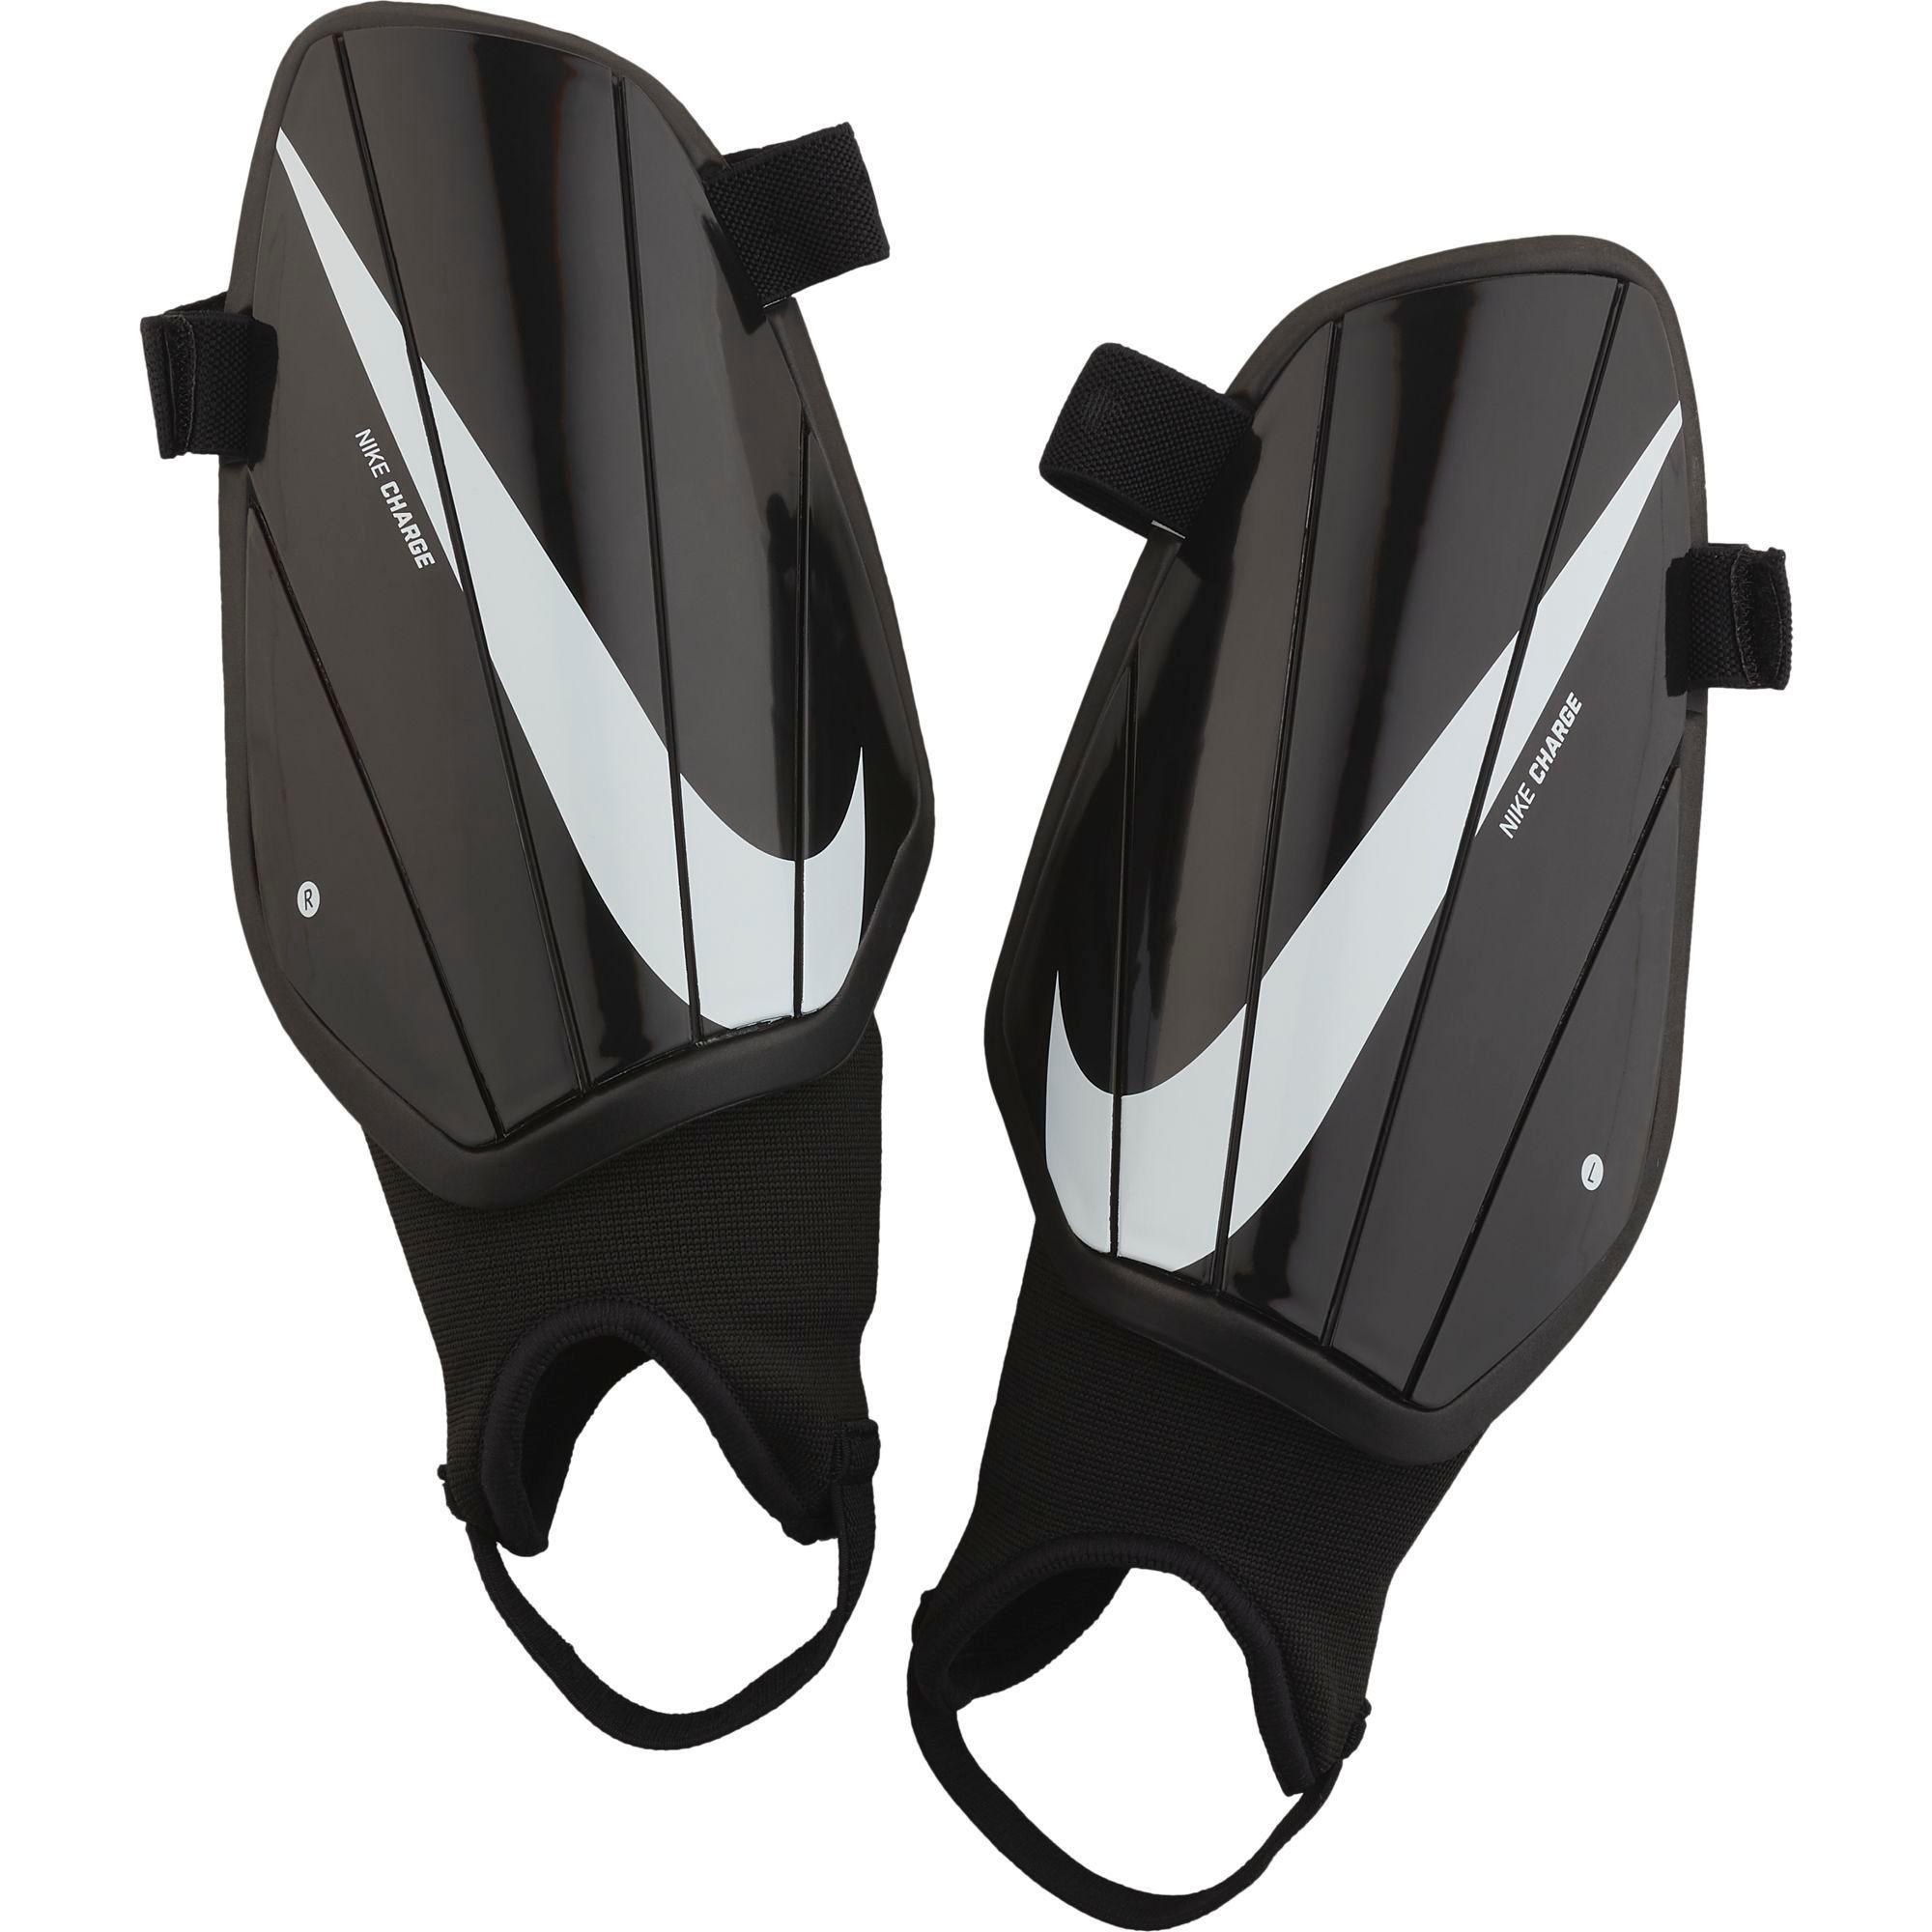 Nike Adult Charge Soccer Shin Guards Nike, Soccer shin